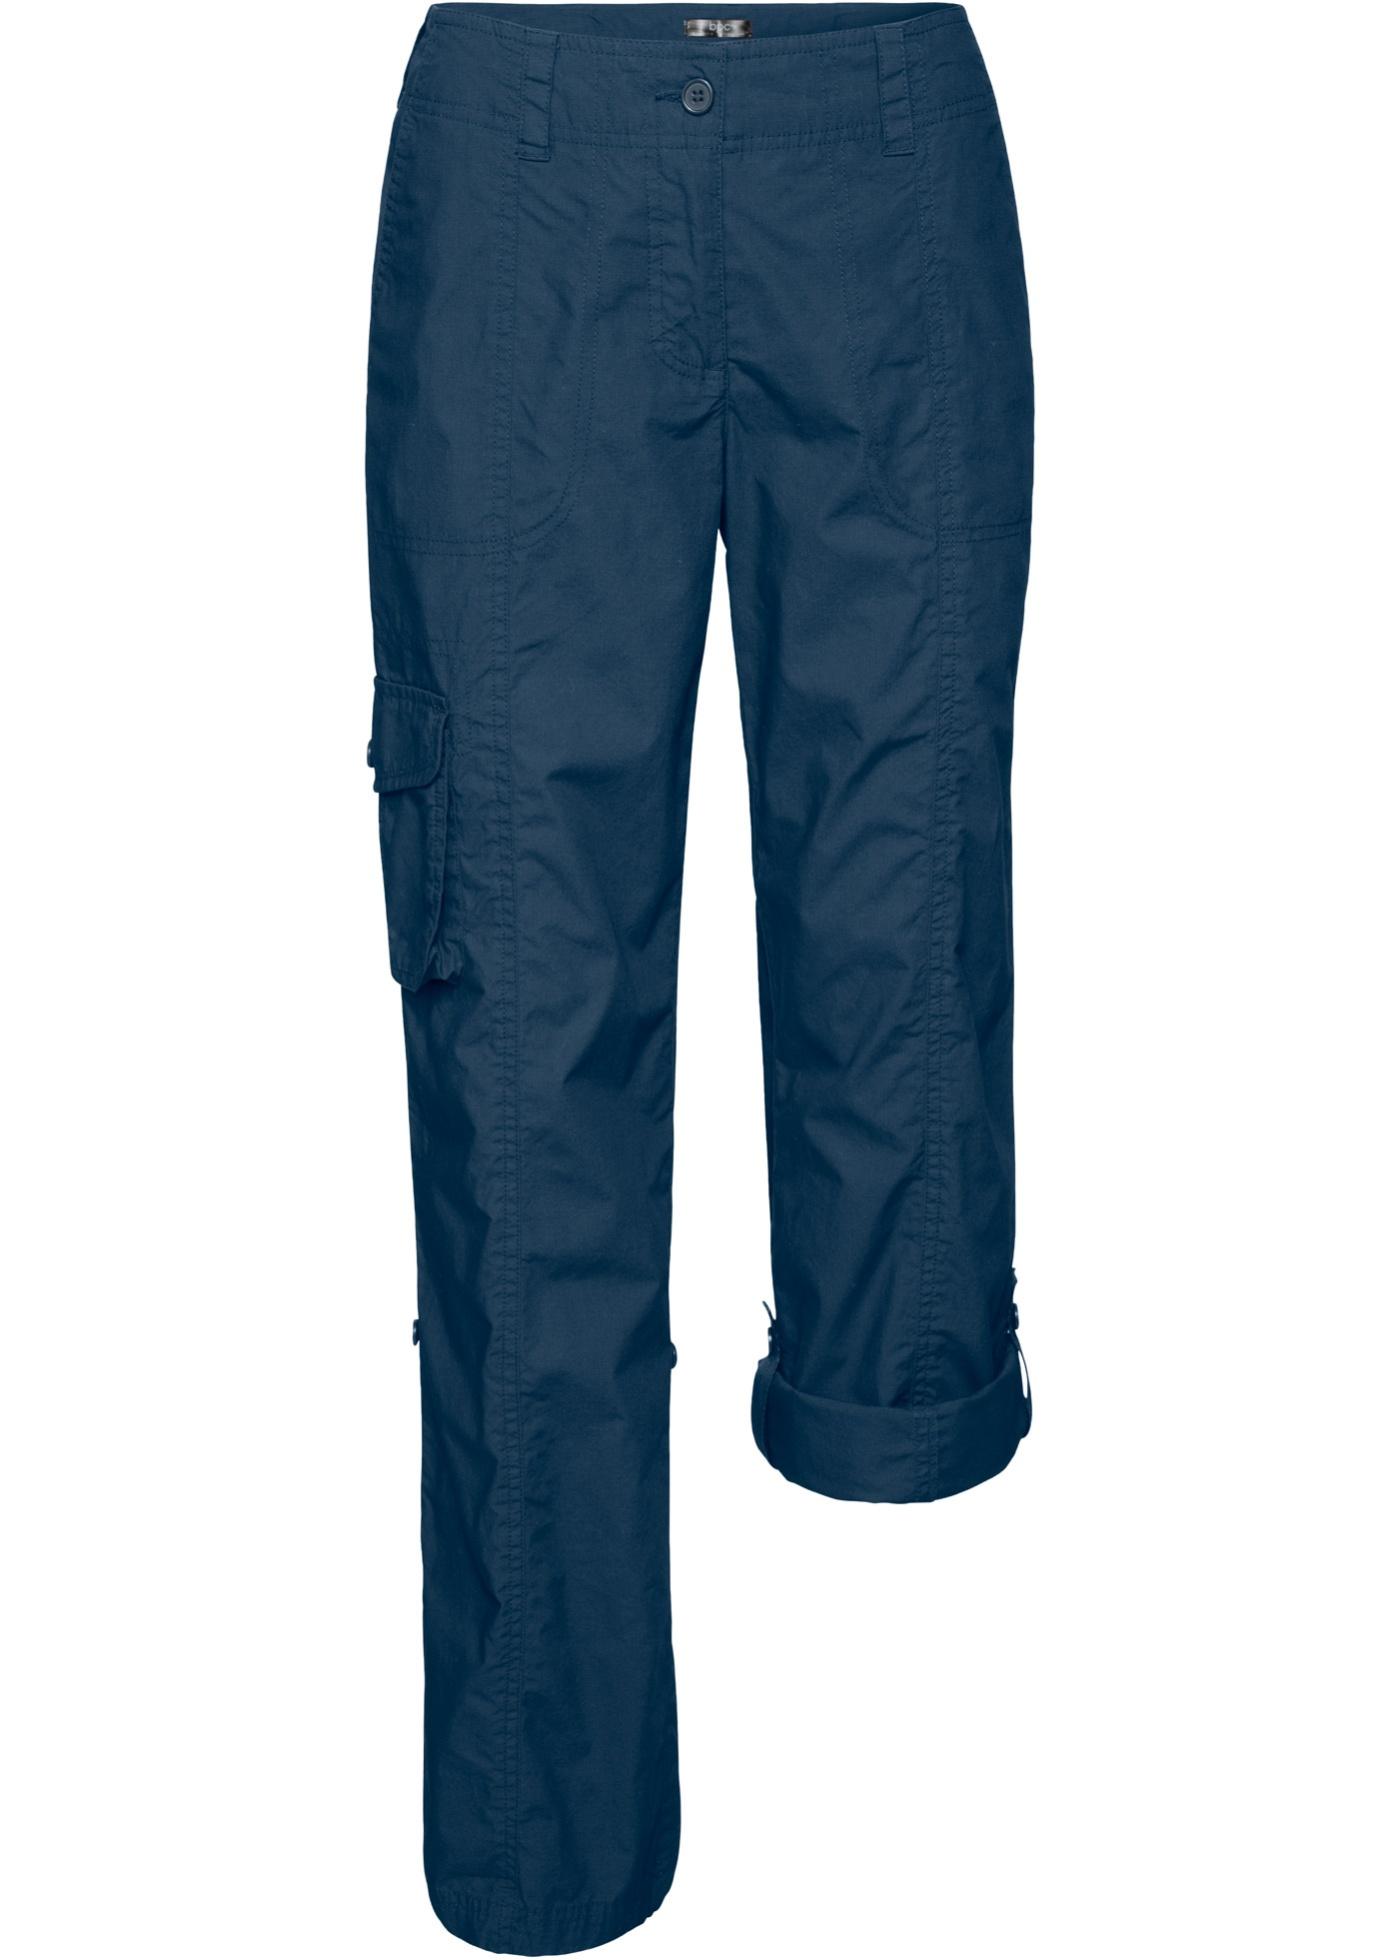 Ohrnovací kargo kalhoty - Modrá